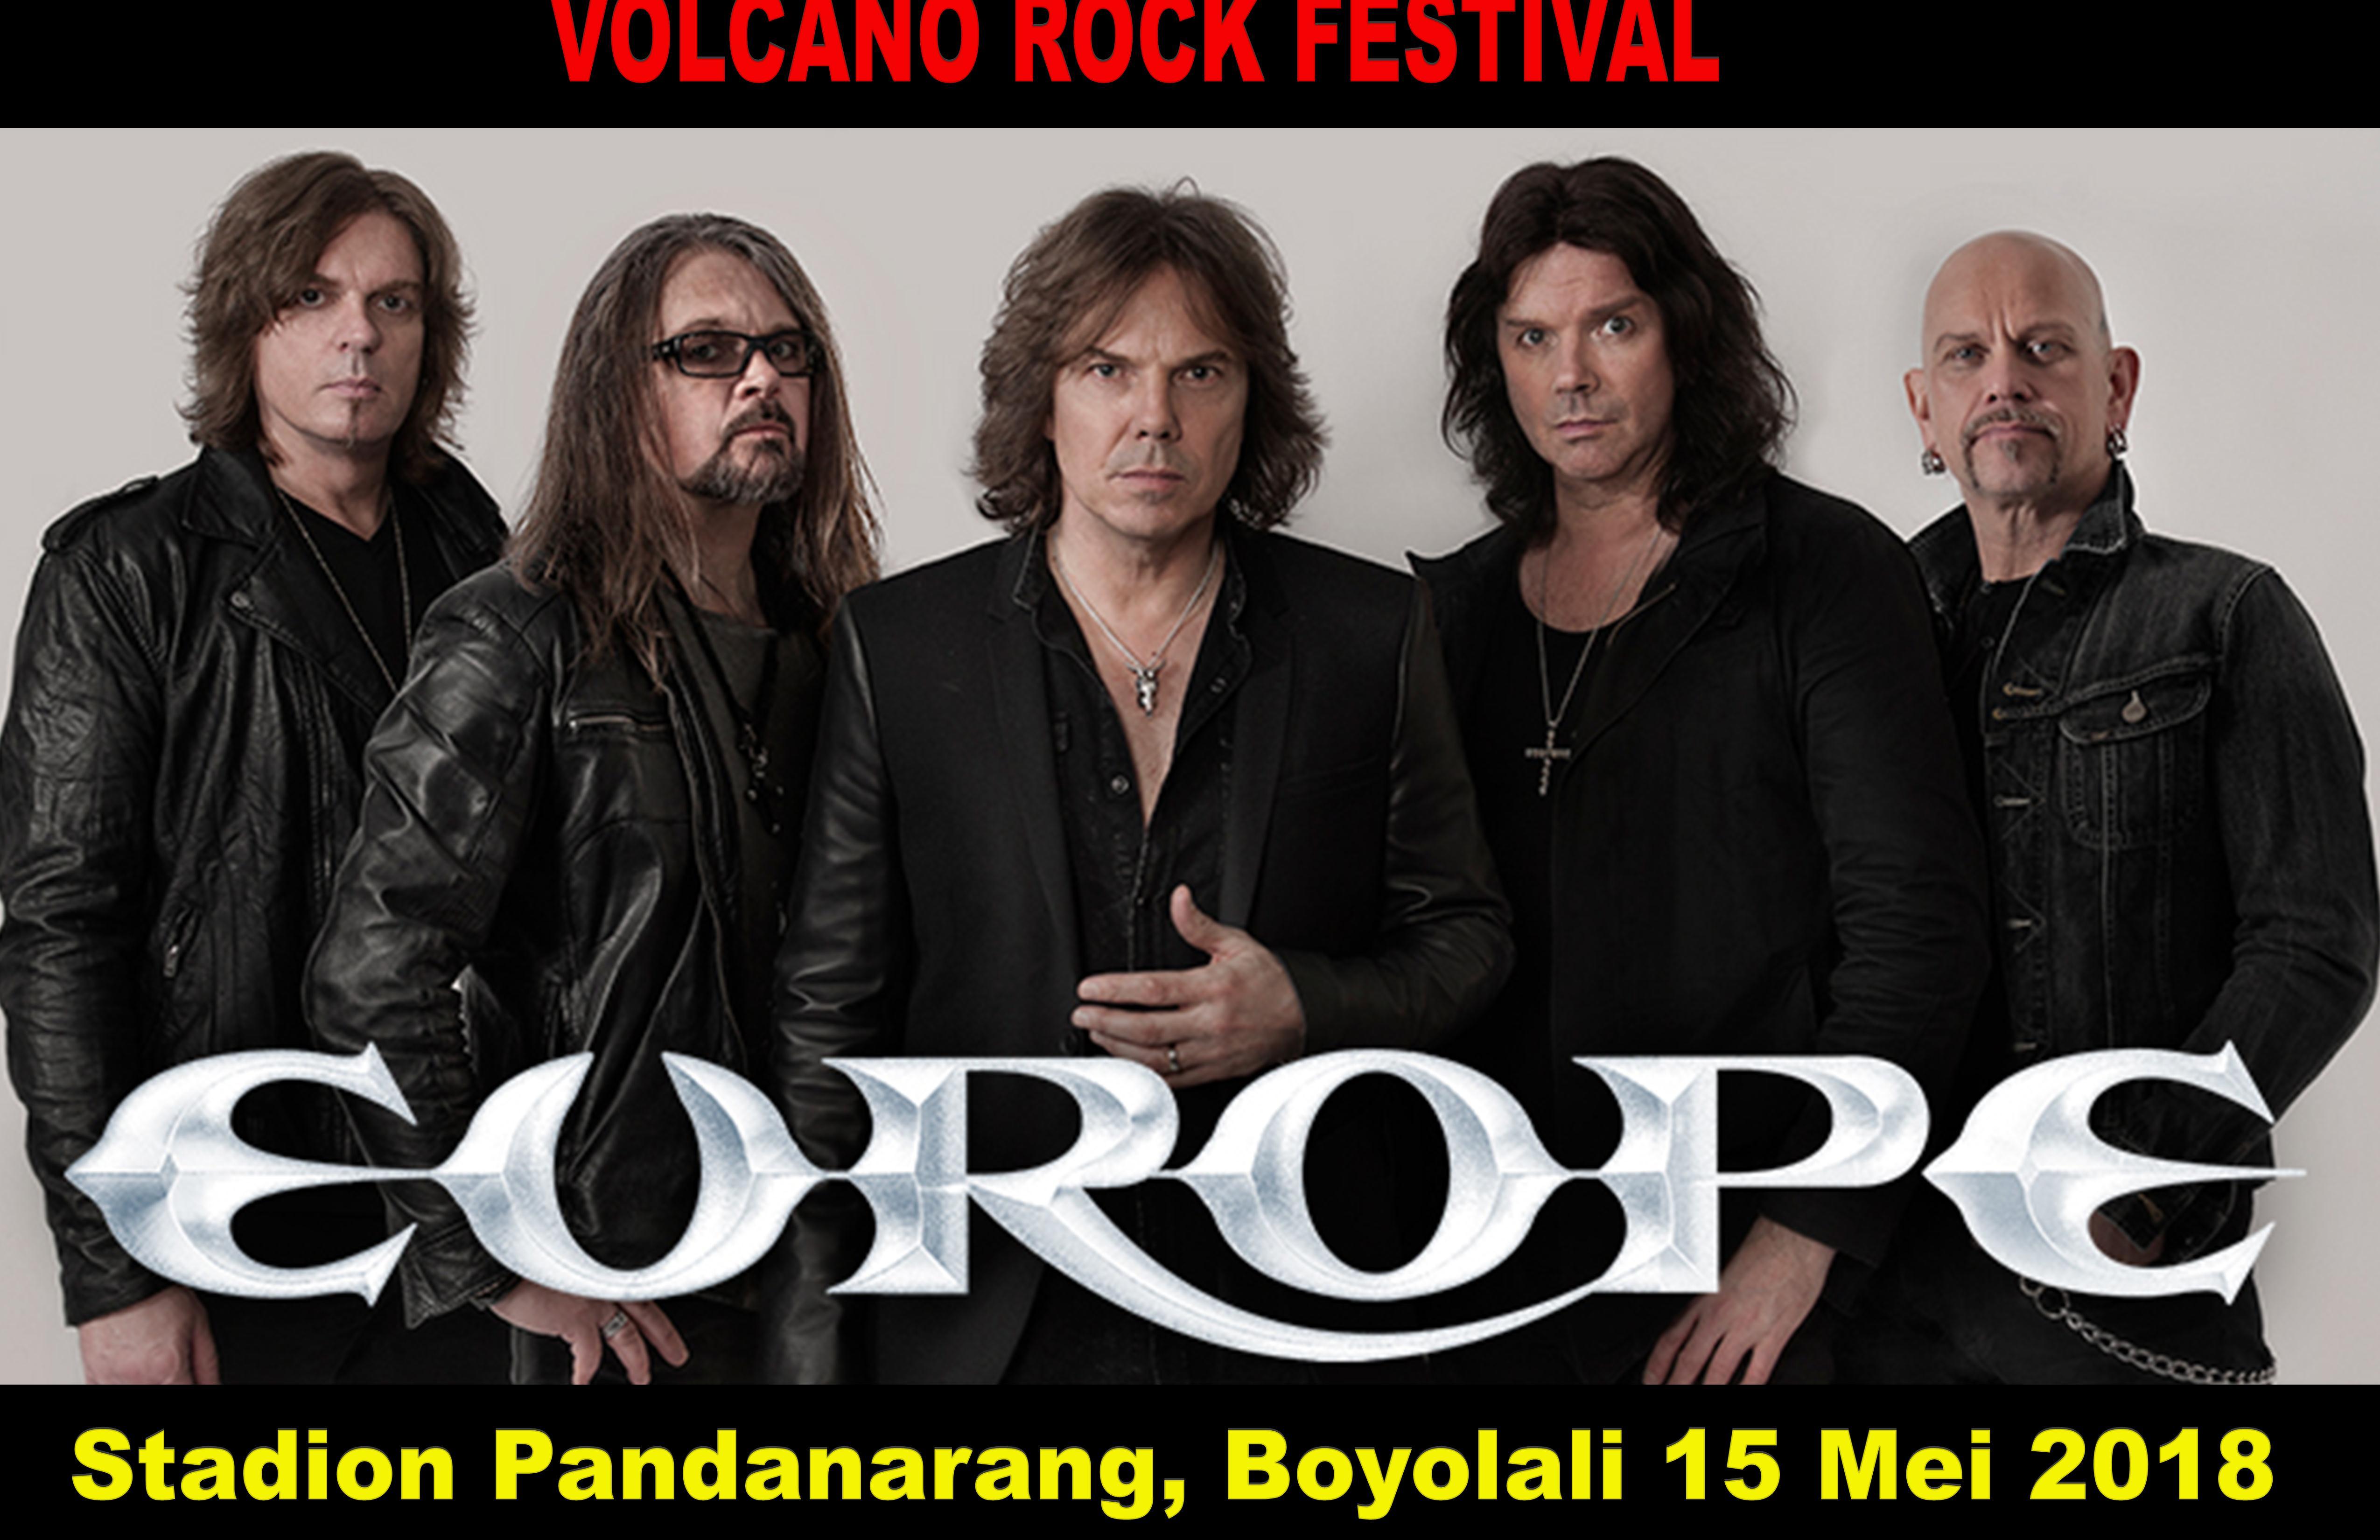 Band rock Europe bakal guncang Boyolali Mei 2018, catat tanggalnya